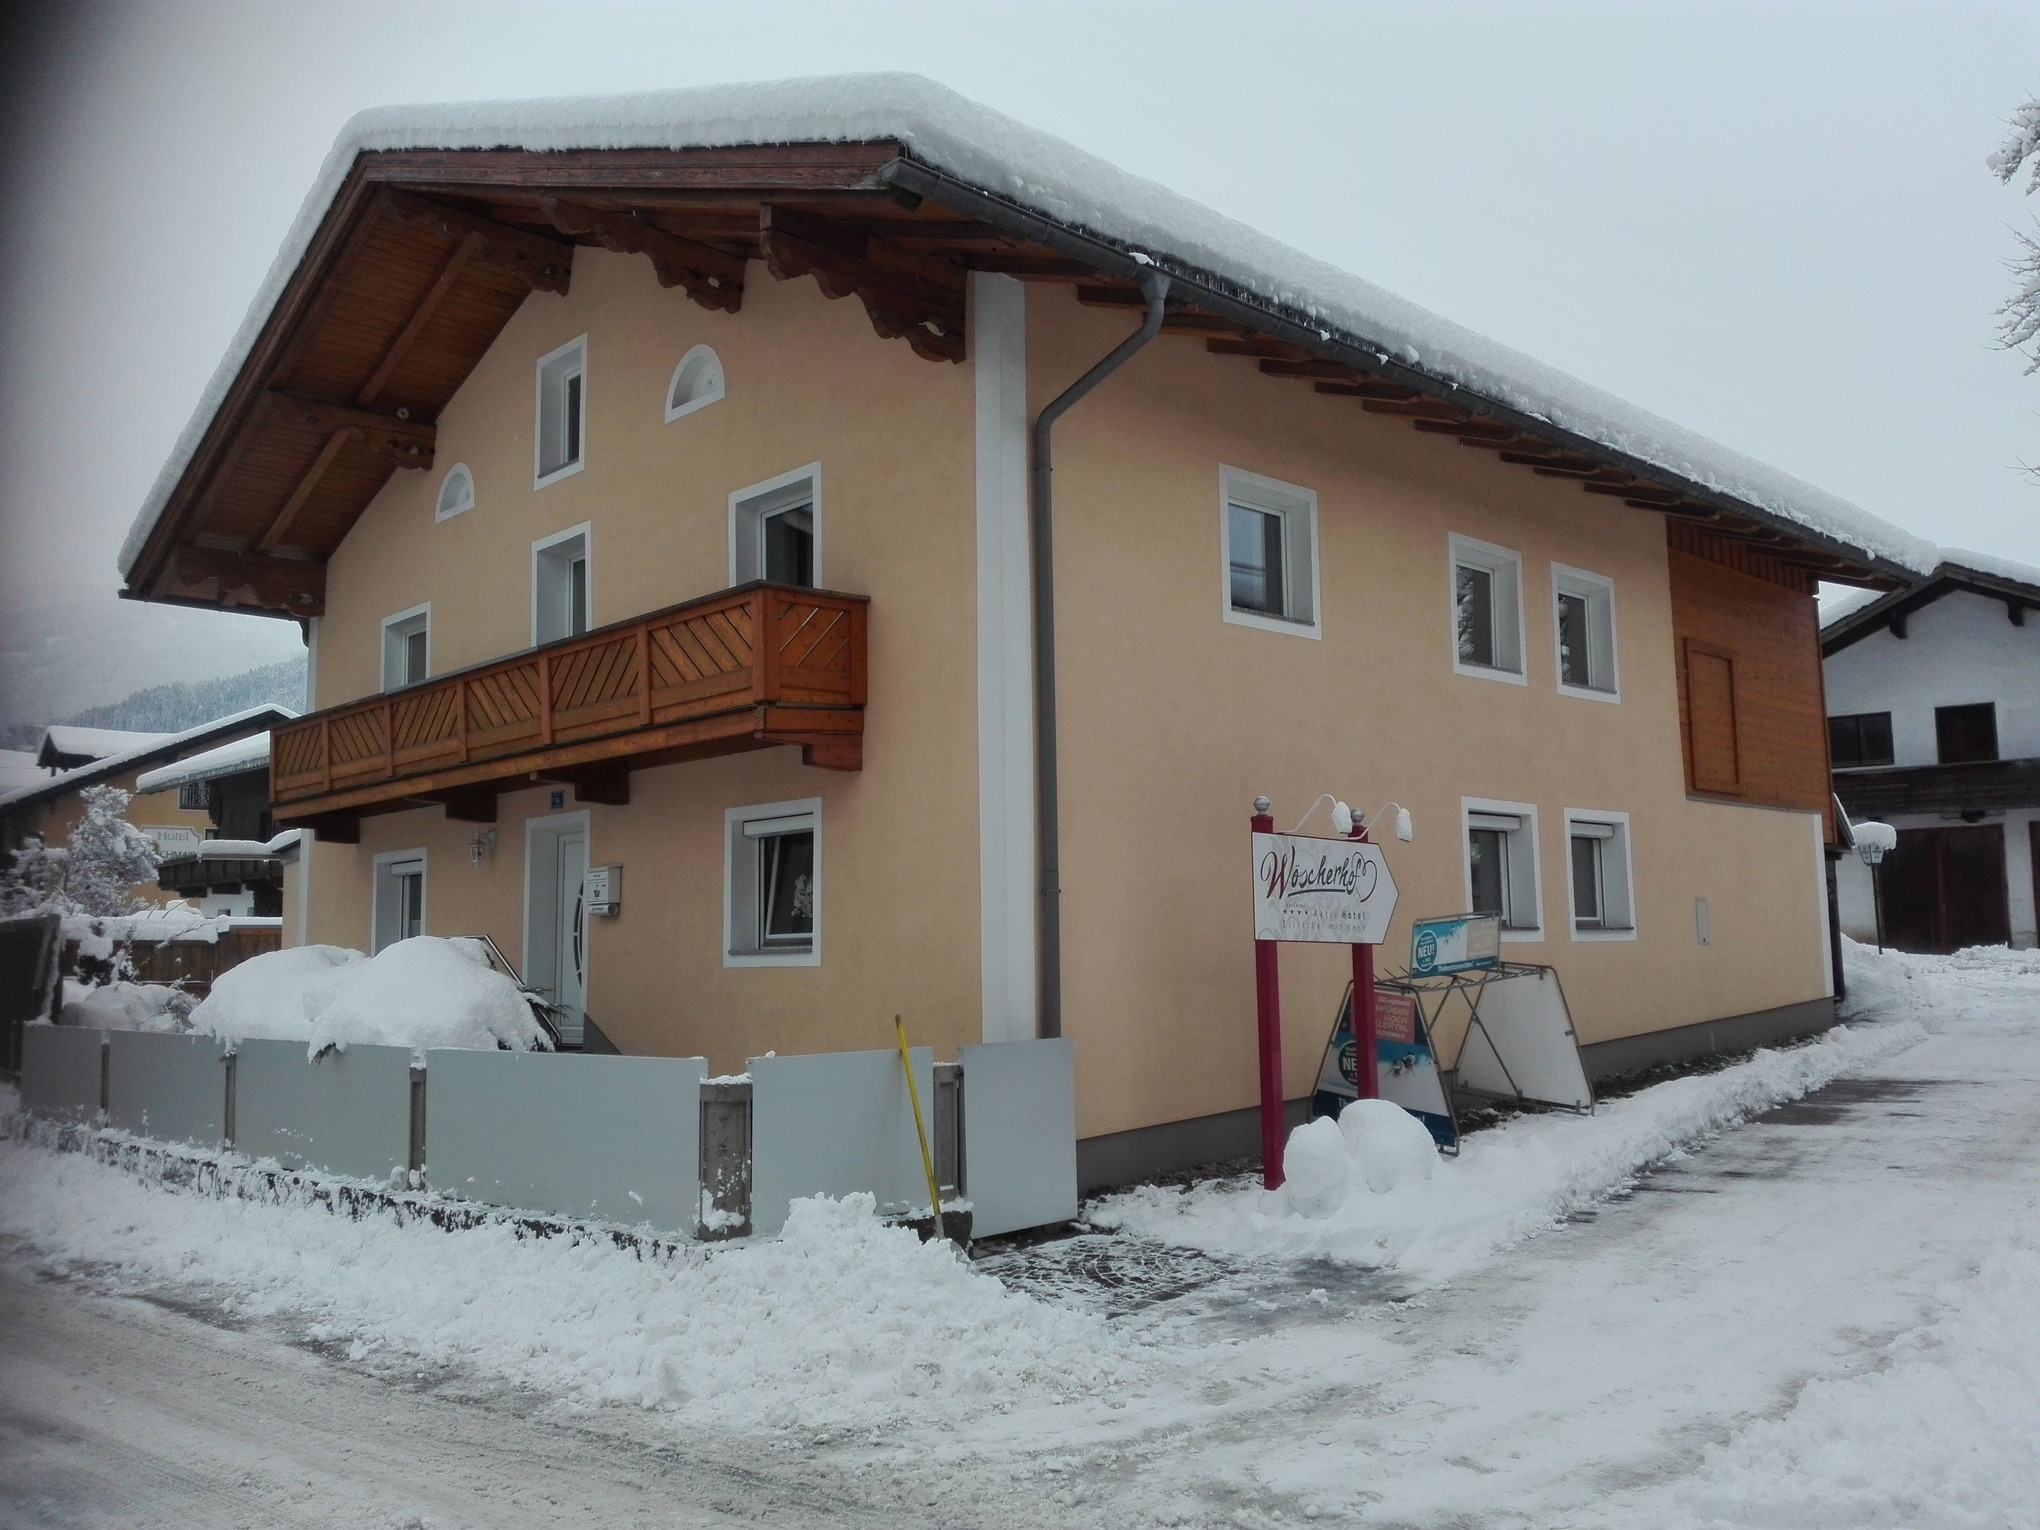 Appartement de vacances Gerti (1995761), Uderns, Zillertal, Tyrol, Autriche, image 1